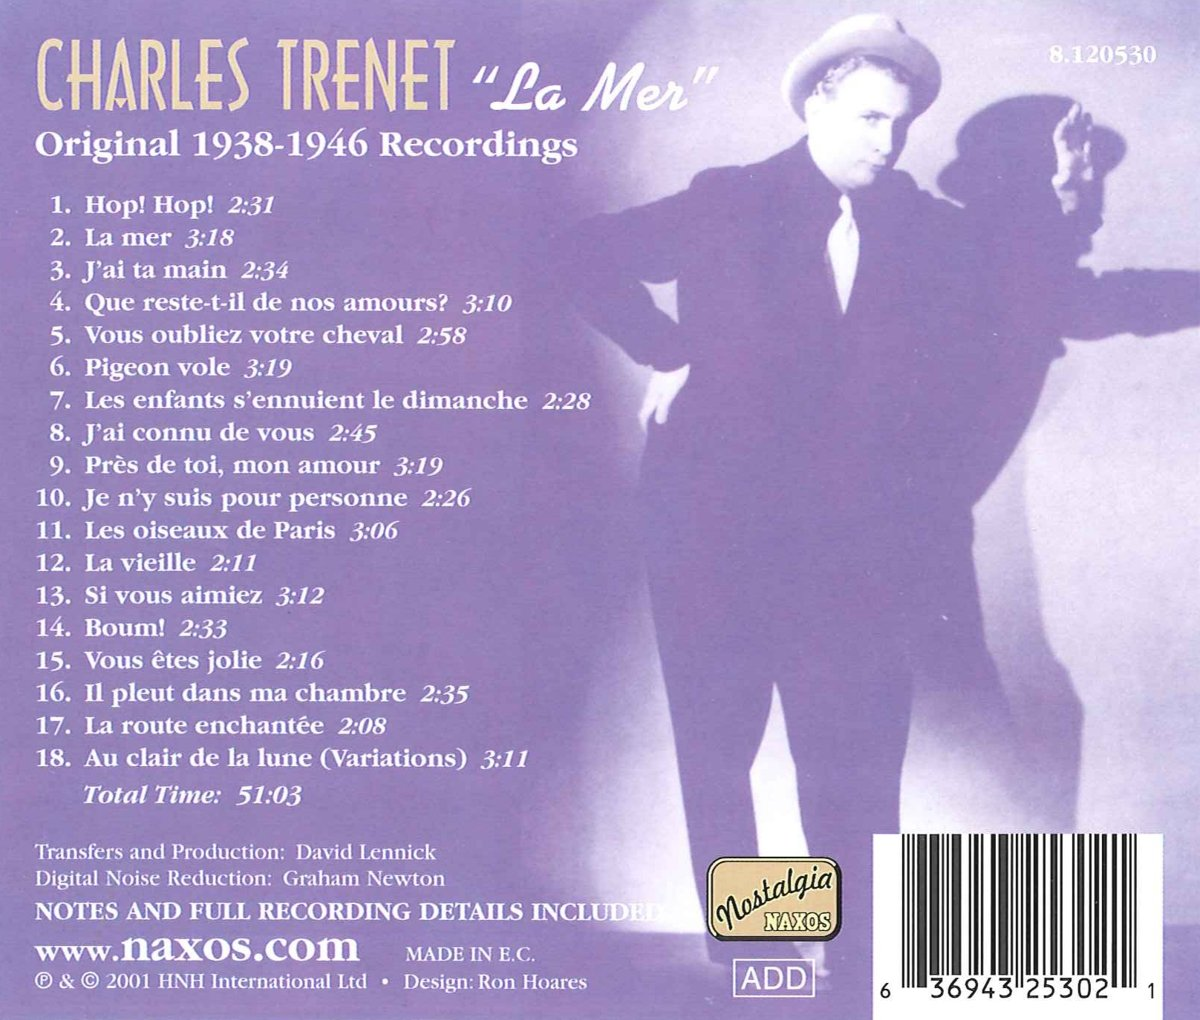 Charles Trénet La Mer (1938-1946) by Naxos